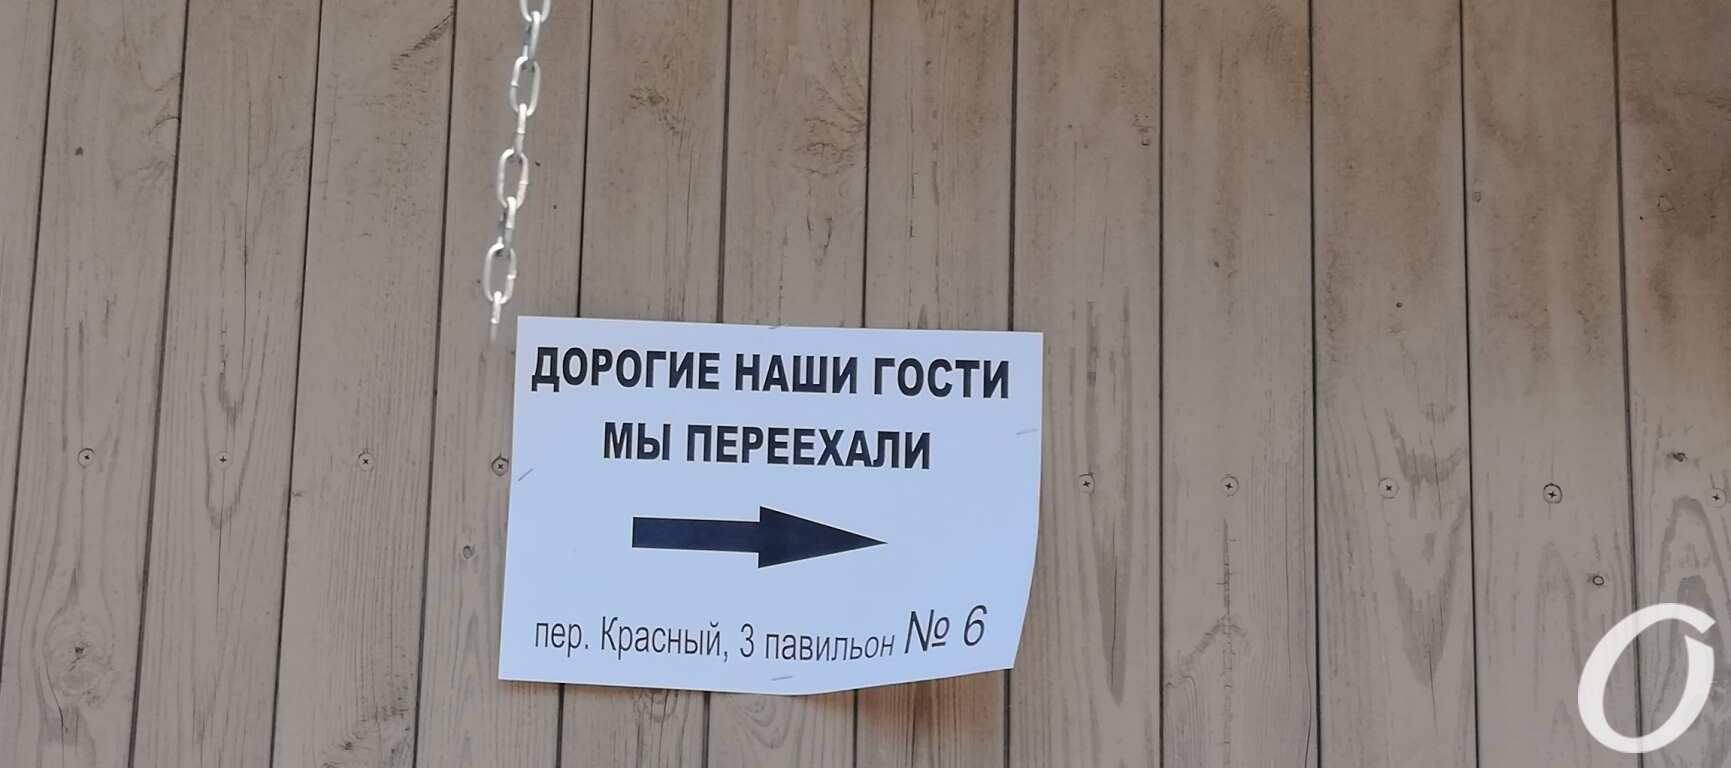 Одесская ярмарка, 6 мая 2021 г., МАФ переехал